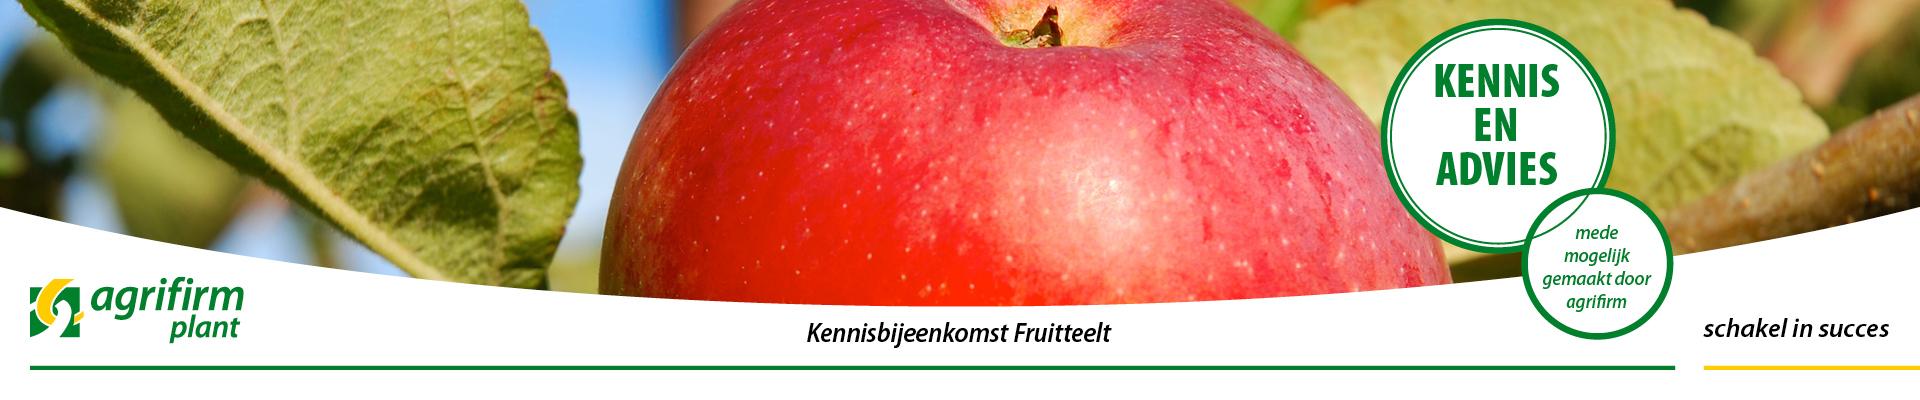 Kennisbijeenkomst Fruitteelt Westwoud